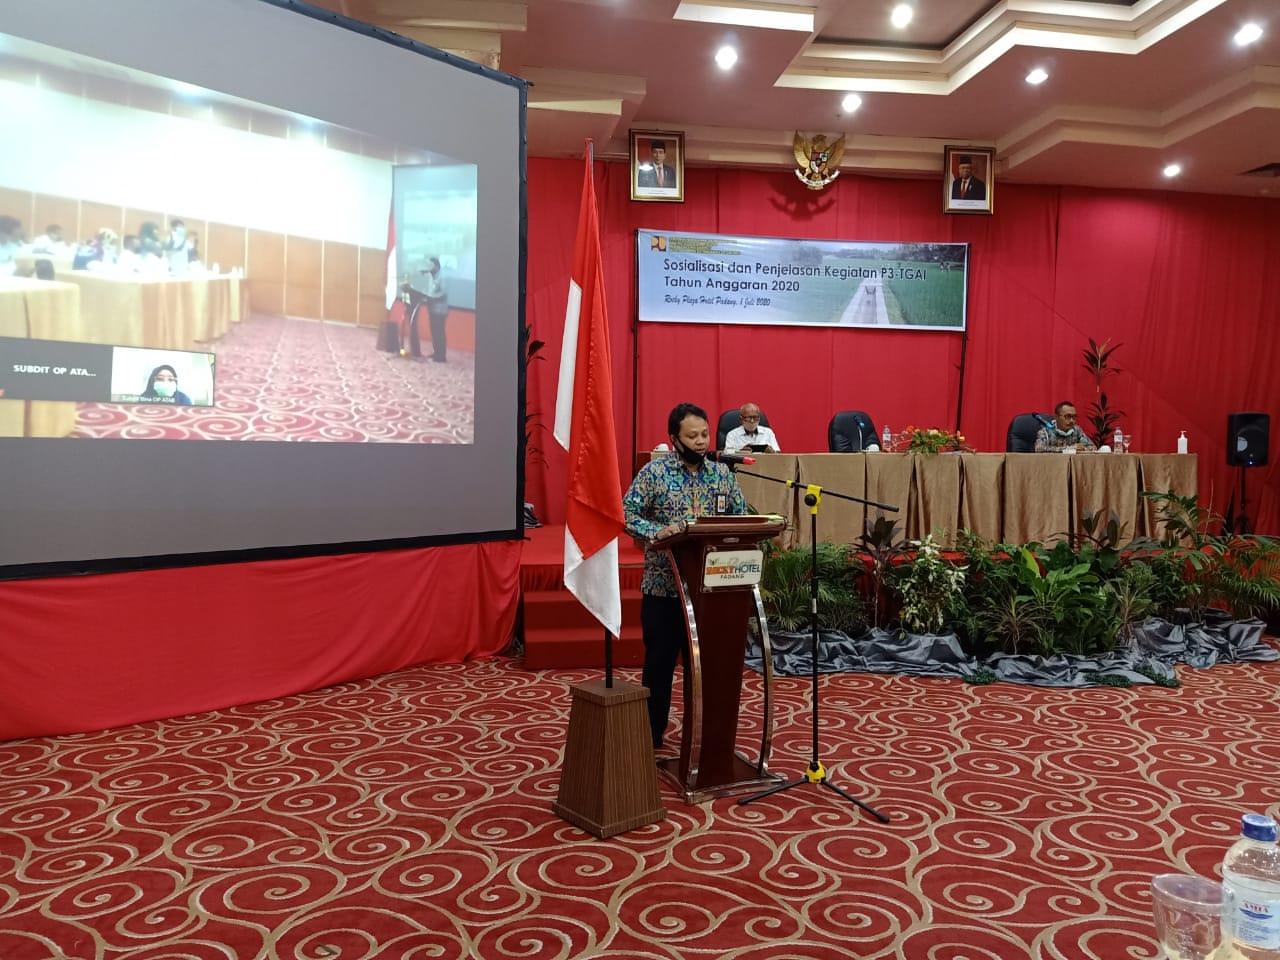 BWS Sumatera V berikan sosialisasi kegiatan P3-TGAI Tahun Anggaran 2020